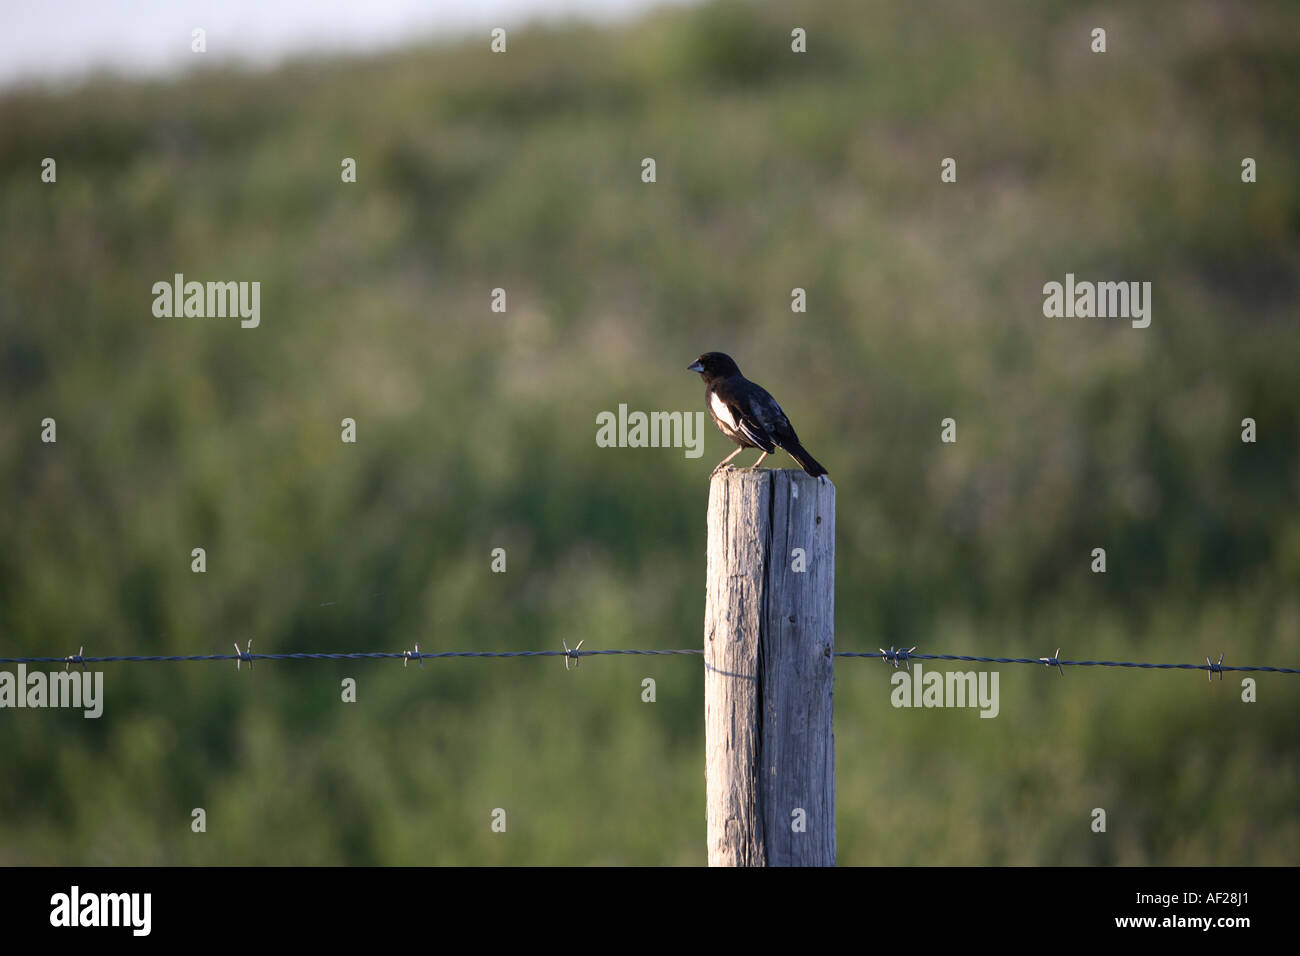 Lark Bunting on fence post in scenic Saskatchewan Canada - Stock Image